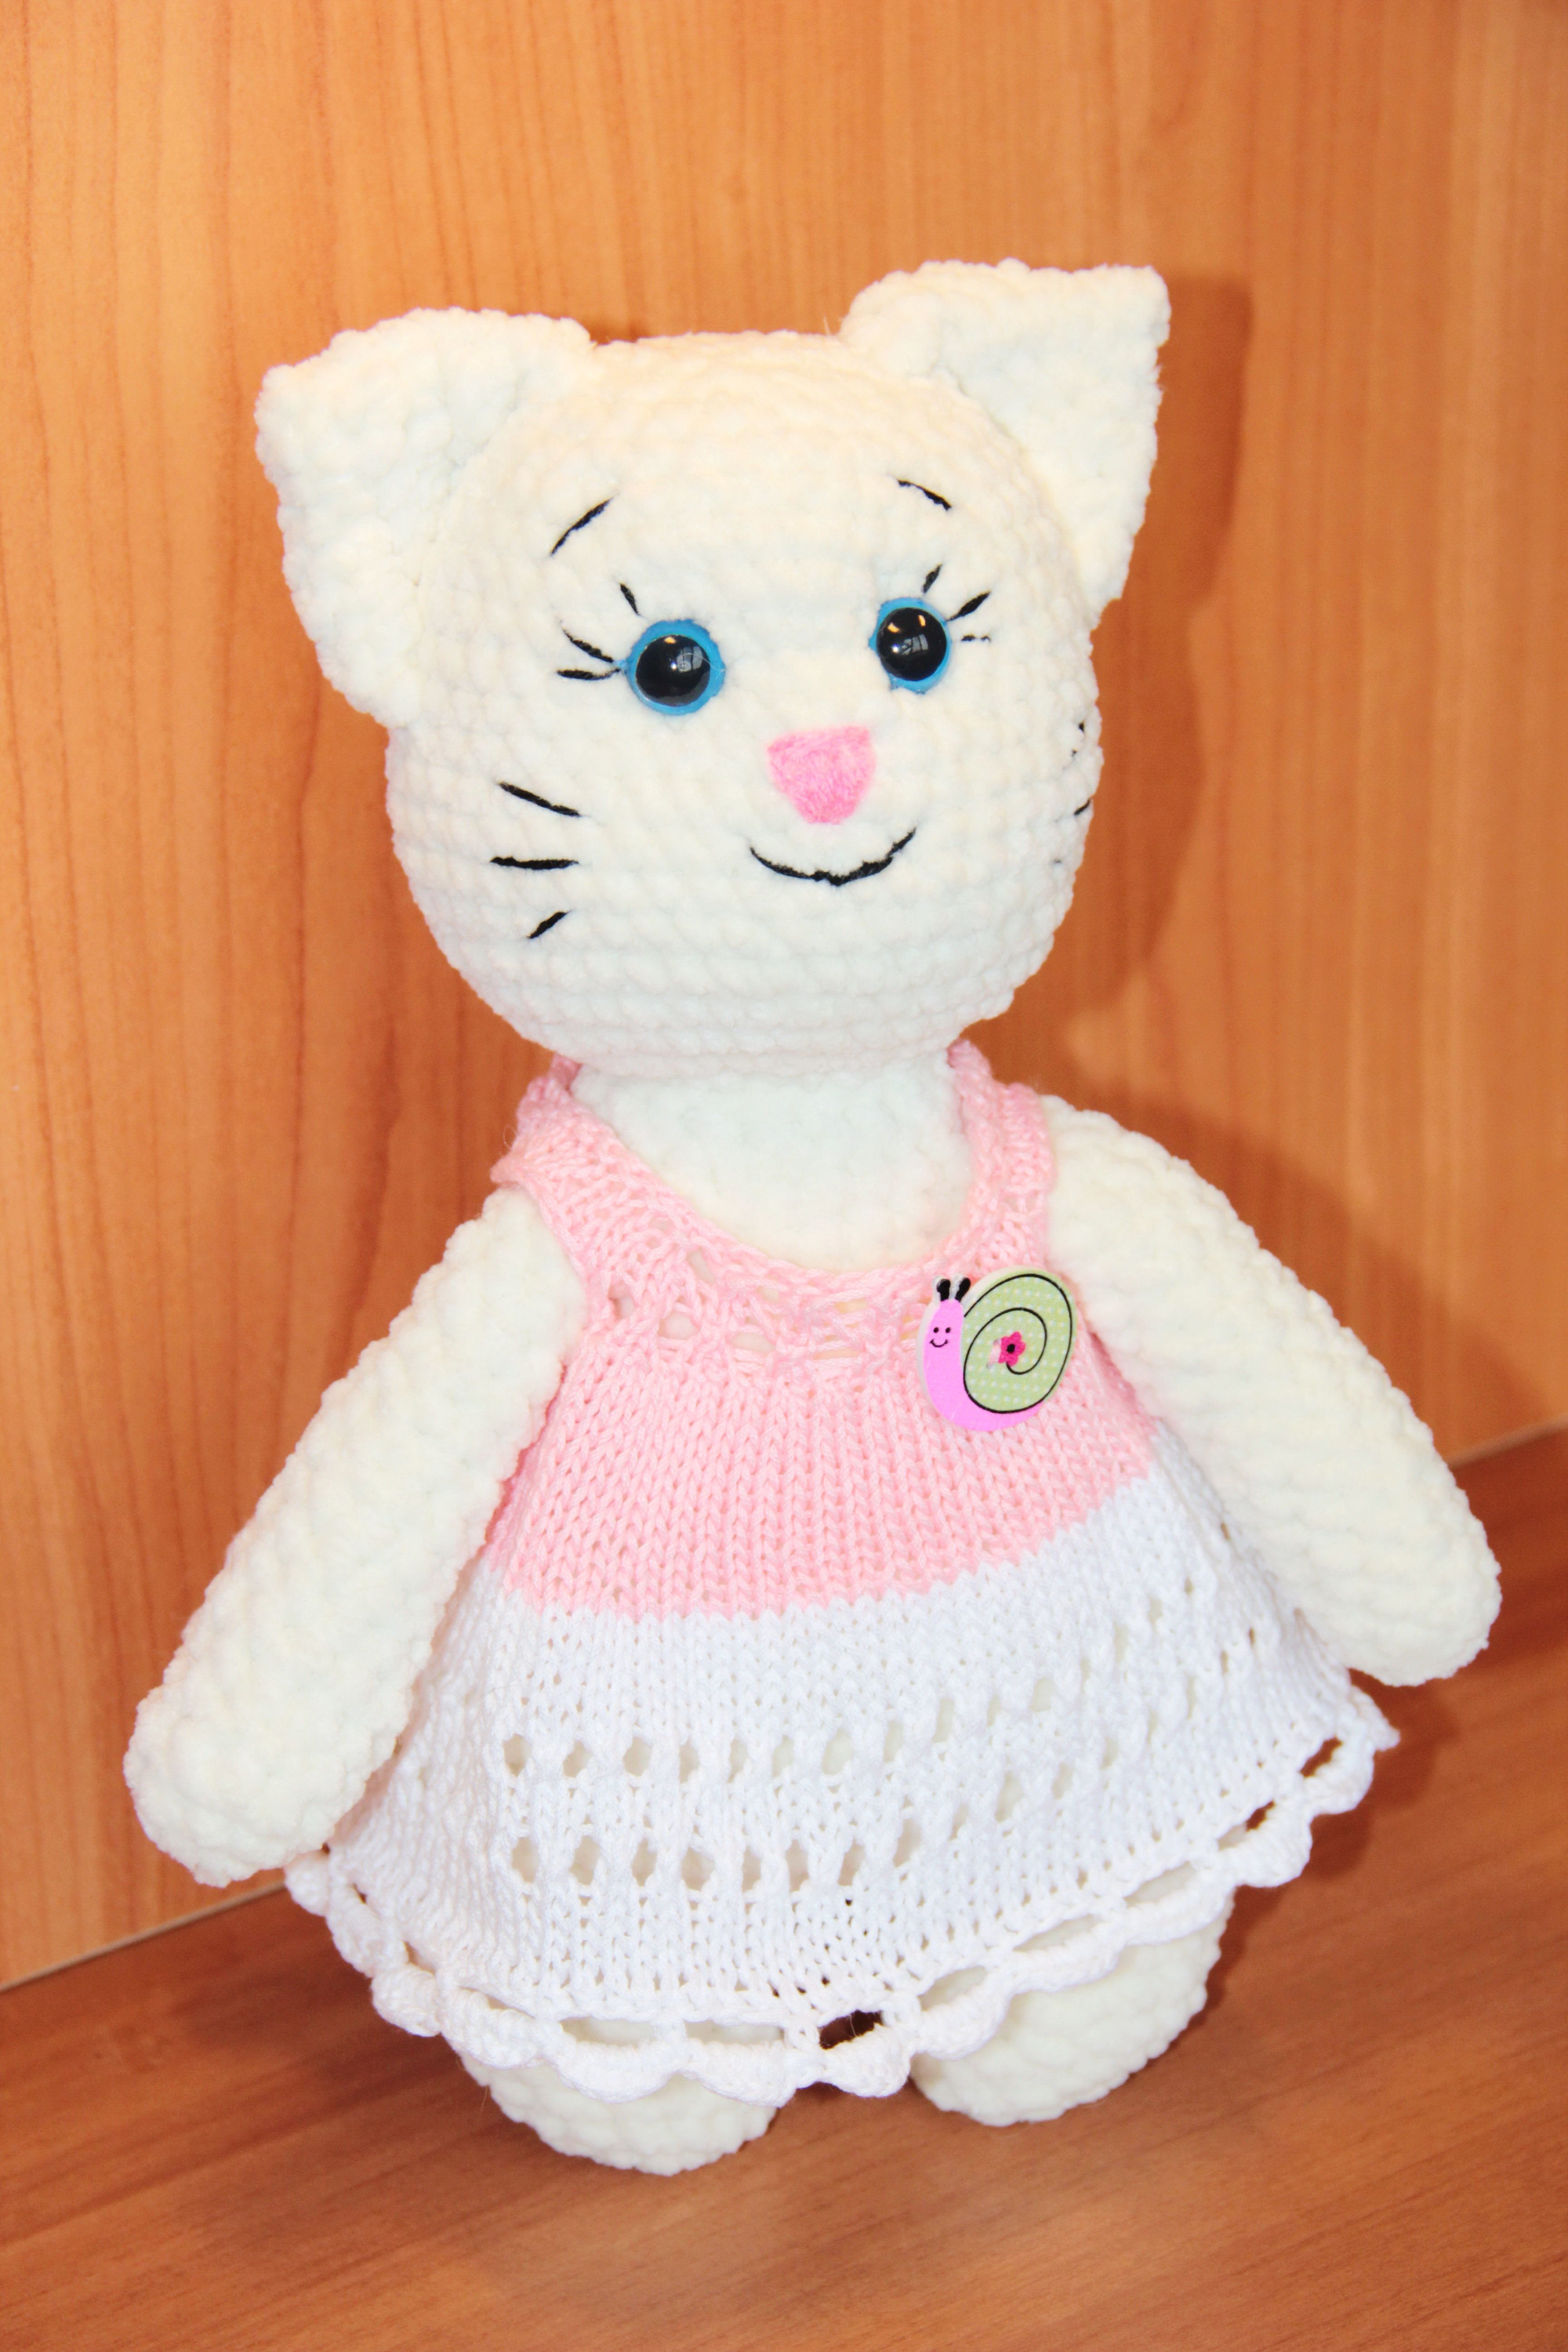 Cute Plush Cat Amigurumi For 1 Year Old Eco Friendly Stuffed Etsy Cat Soft Toy Stuffed Animal Cat Cute Plush